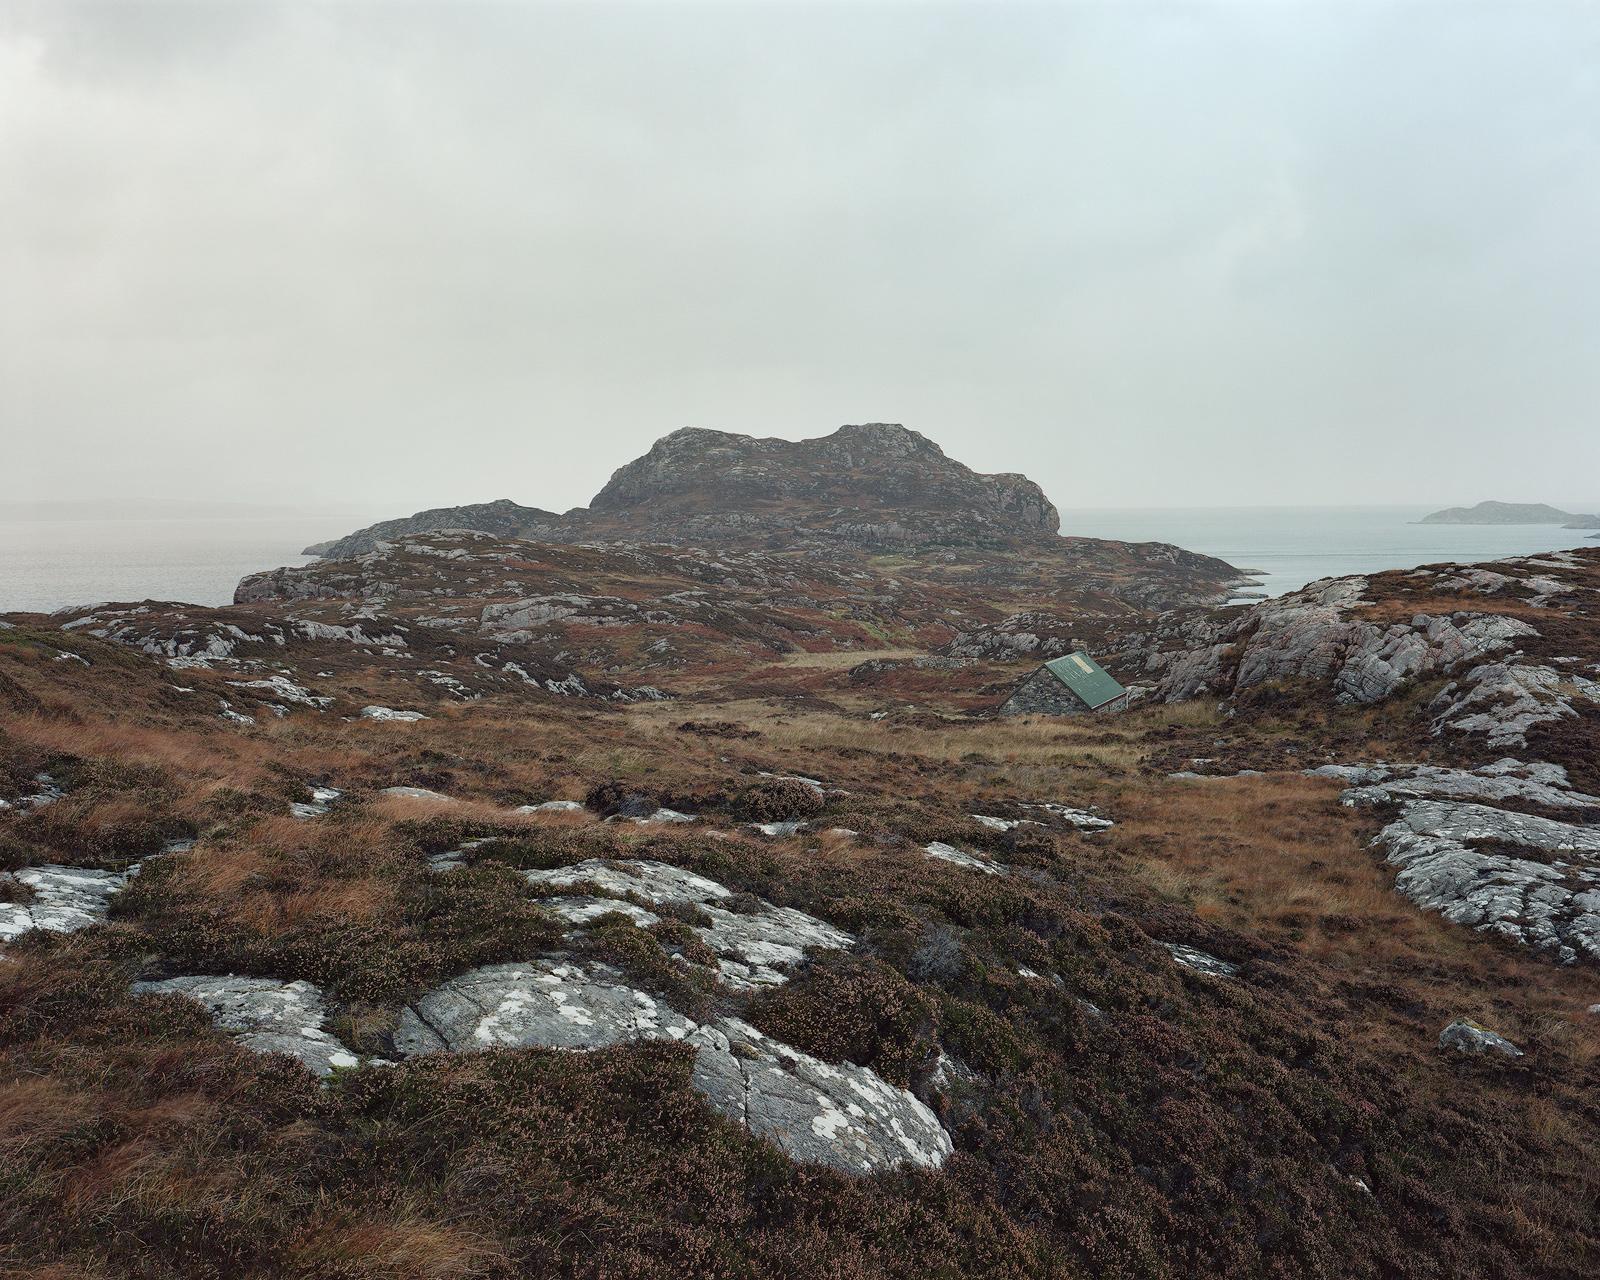 nicholaswhite_Taigh Thormoid Dhuibh, Raasay, Scotland.jpg